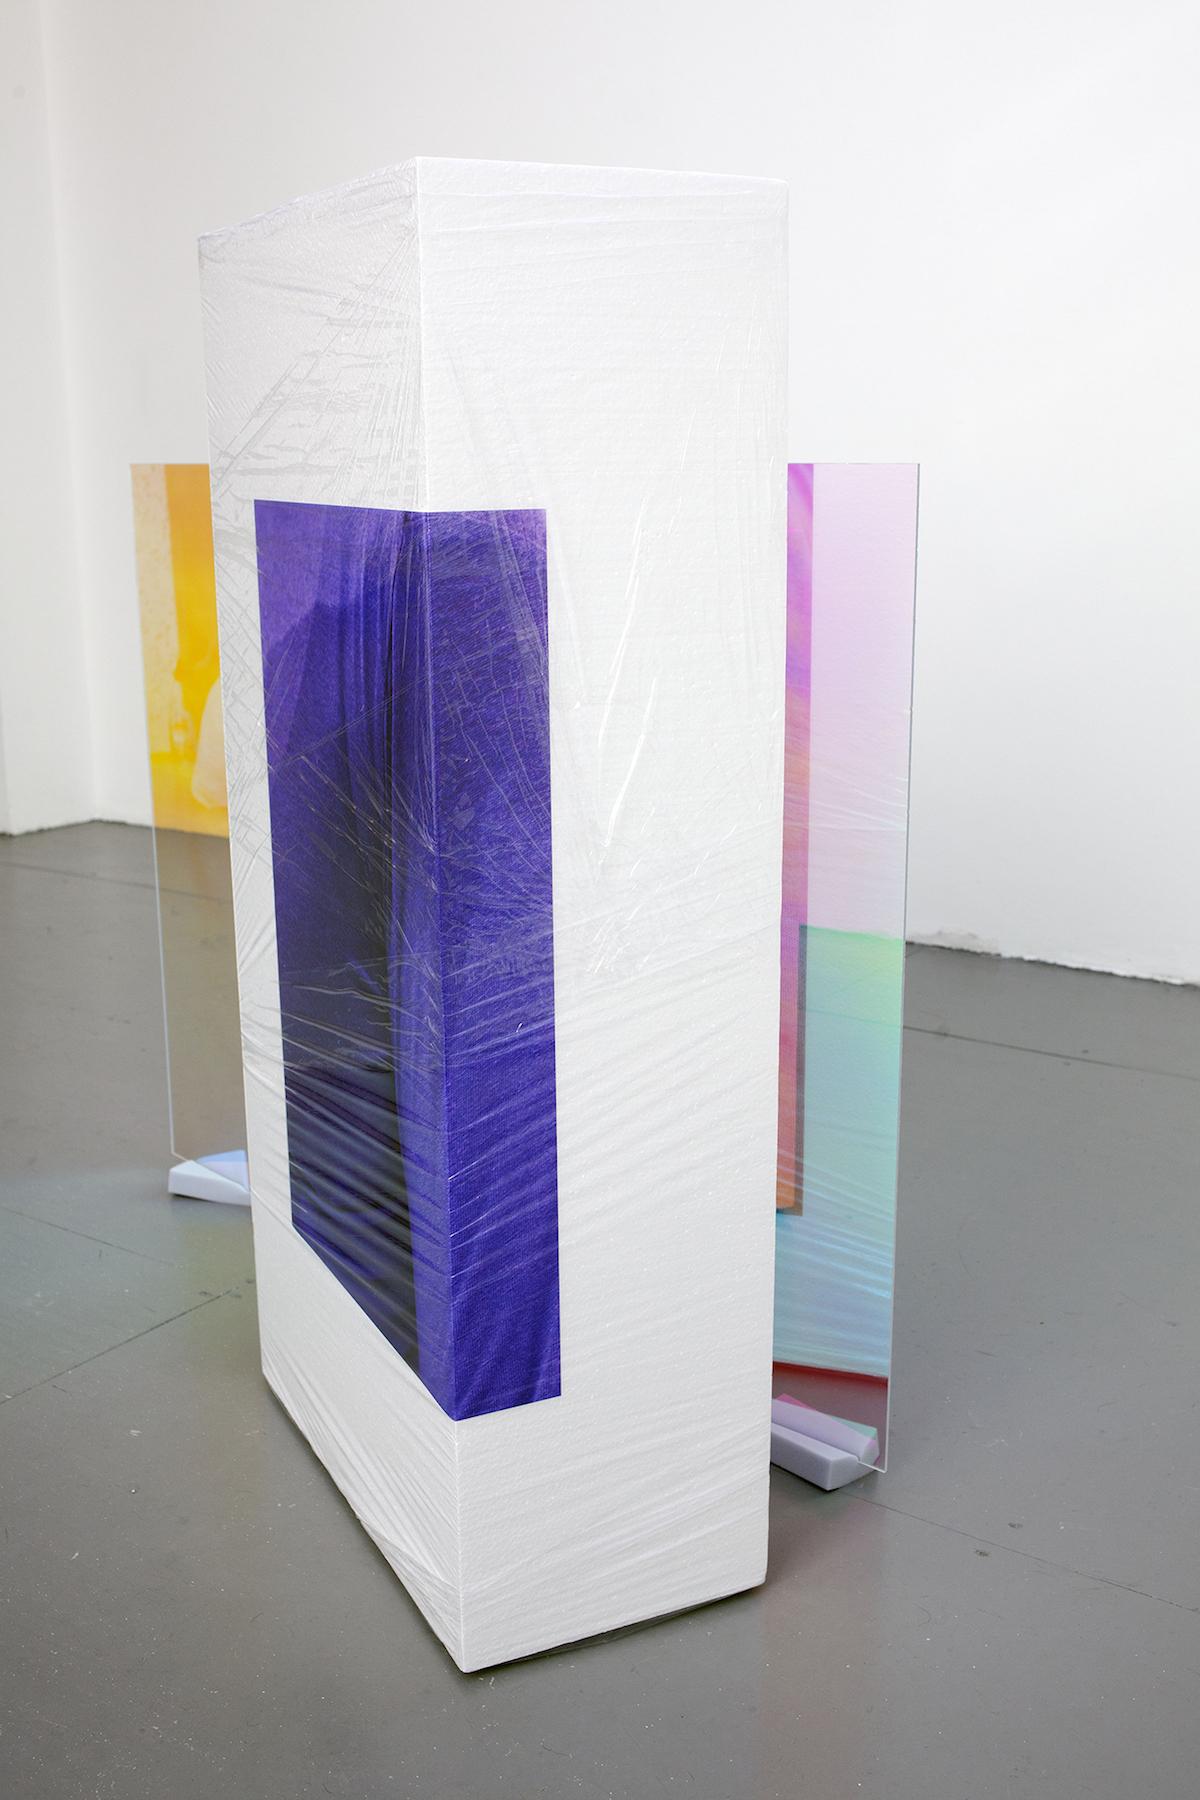 Sweaty Sculpture (uneven) , 115 x 110 x 102 cm, photo-stickers on polystyrene, cellophane, sponges, radiant plexiglass